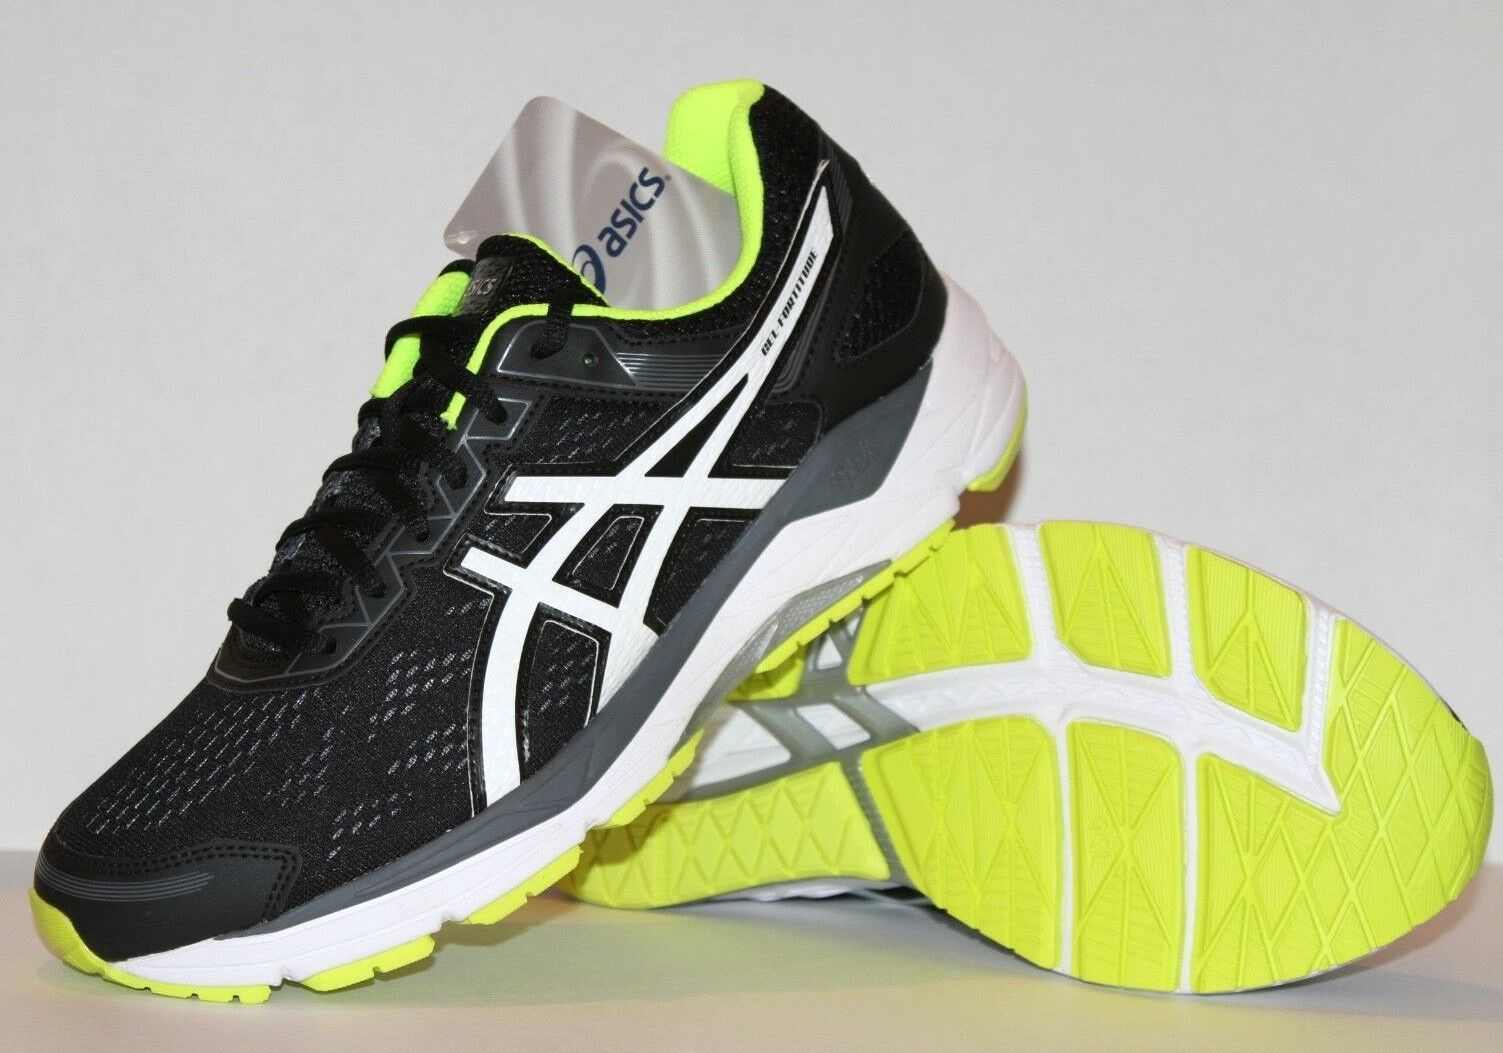 NEW ASICS GEL GEL GEL FORTITUDE 7 Running scarpe Uomo 9 9.5 nero T5G2N f06d30